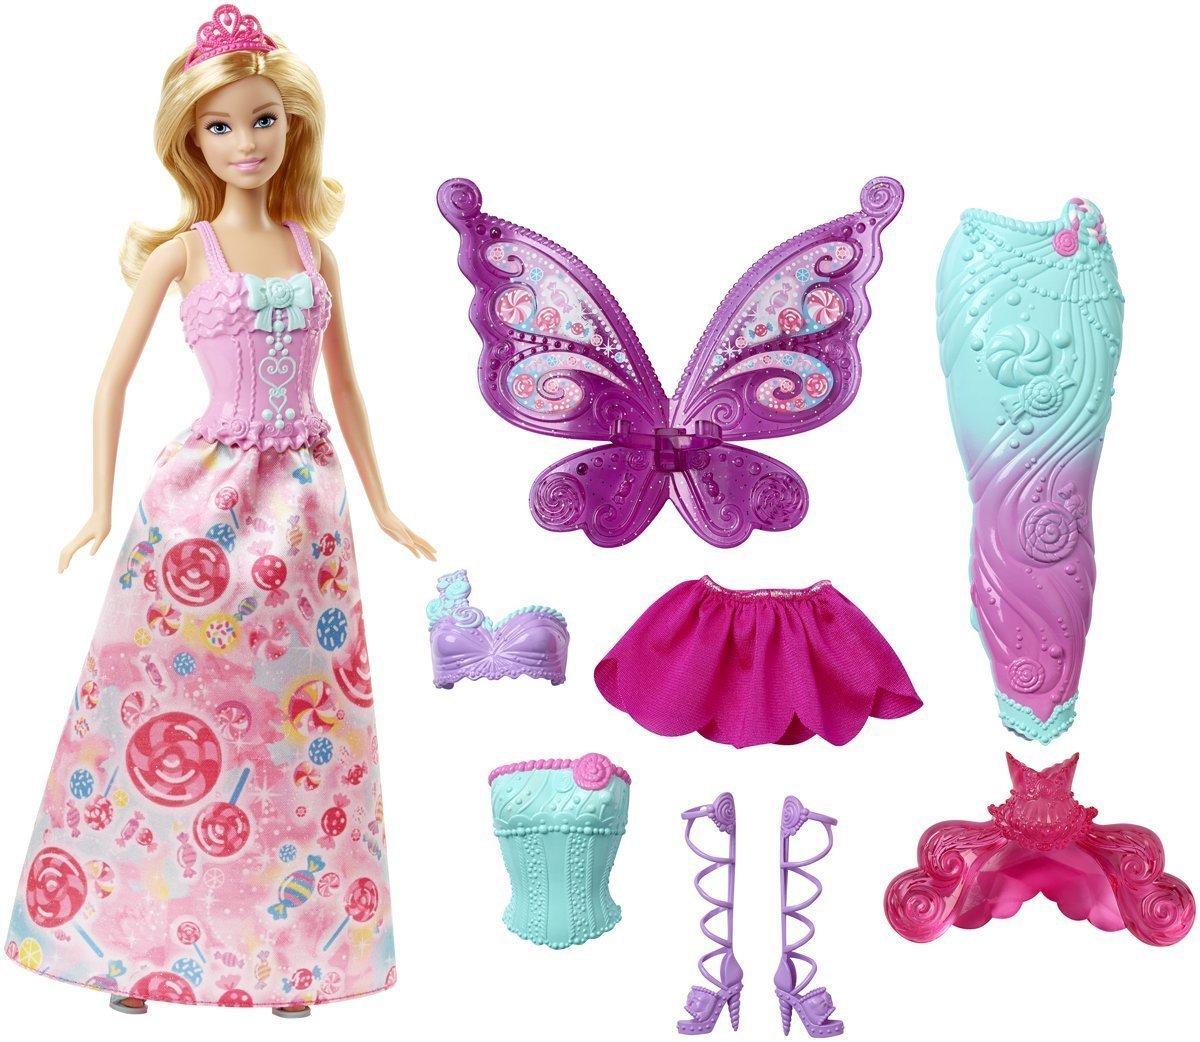 Сказочная принцесса BarbieКуклы Barbie (Барби)<br>Сказочная принцесса Barbie<br>